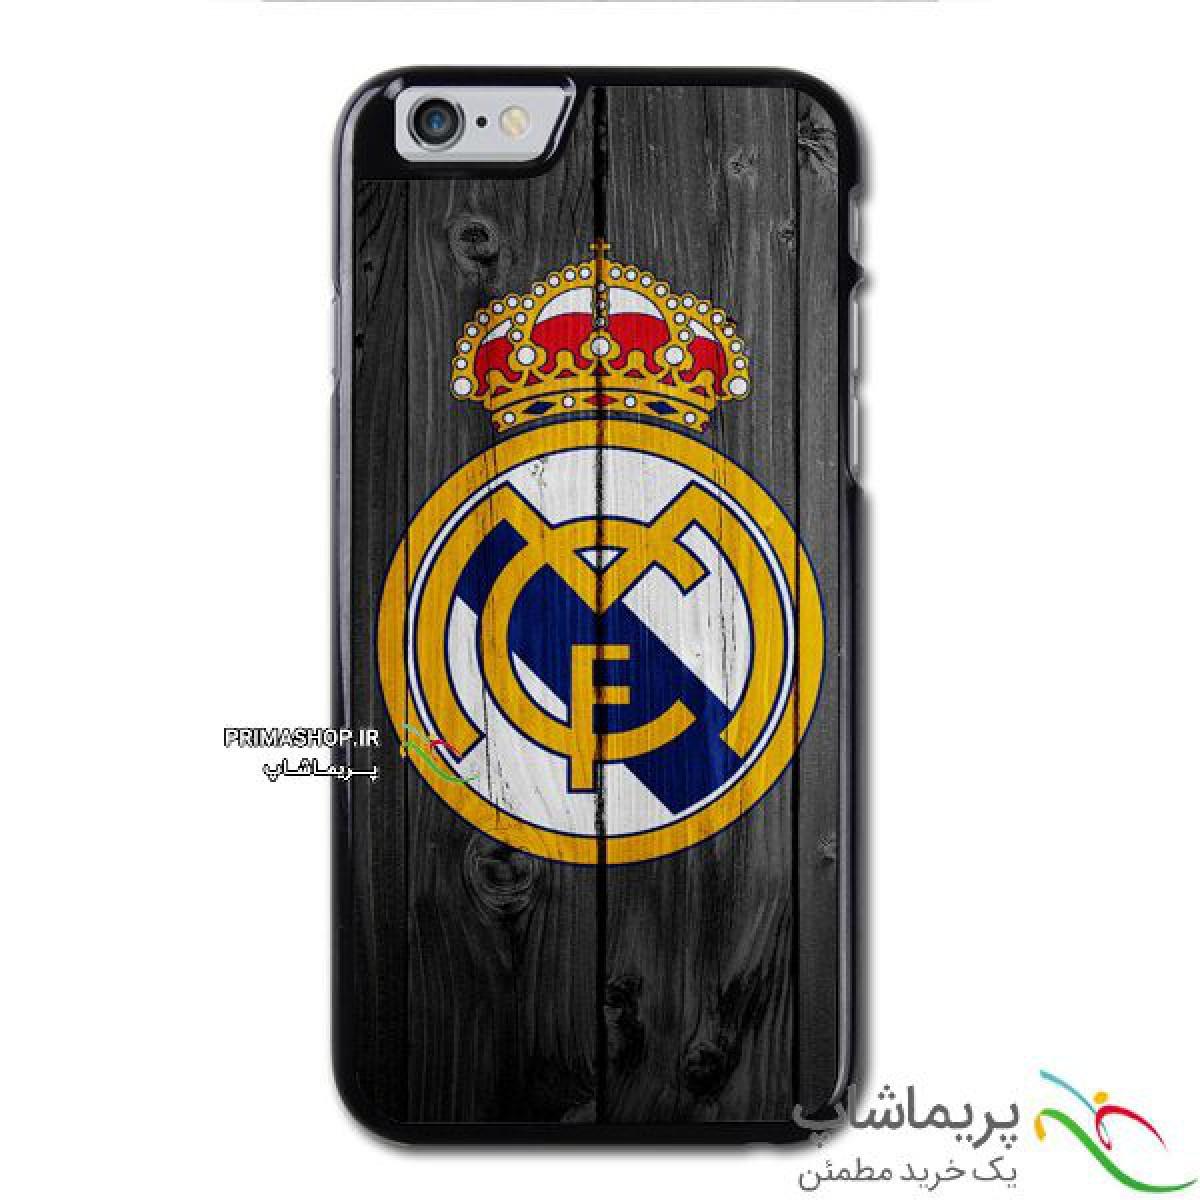 قاب موبایل رئال مادرید جدید 2017(3)